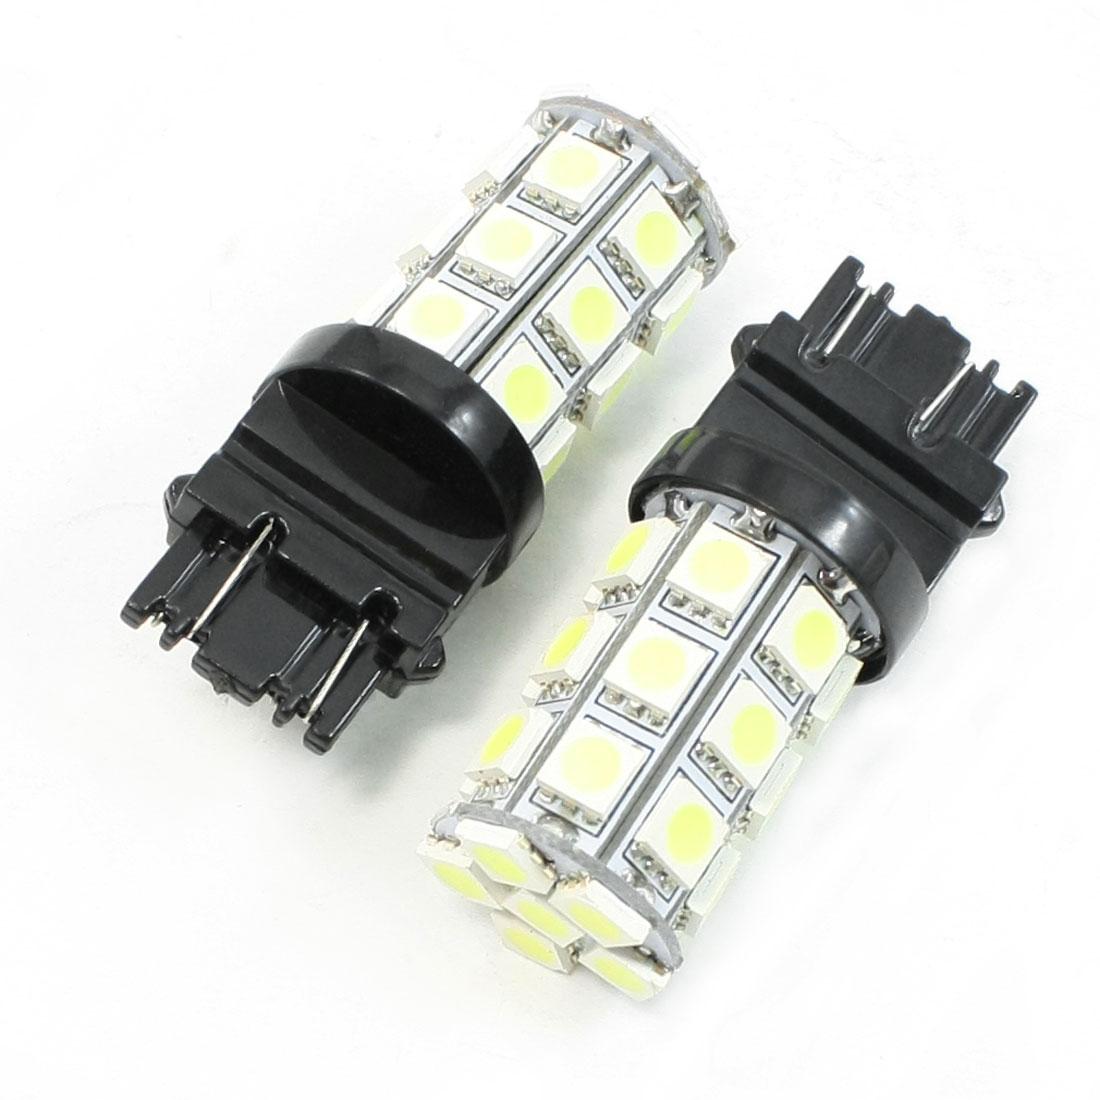 2x White 7443 7440 7444NA T20 27 SMD 5050 Stop Tail Brake LED Light Bulb Lamp